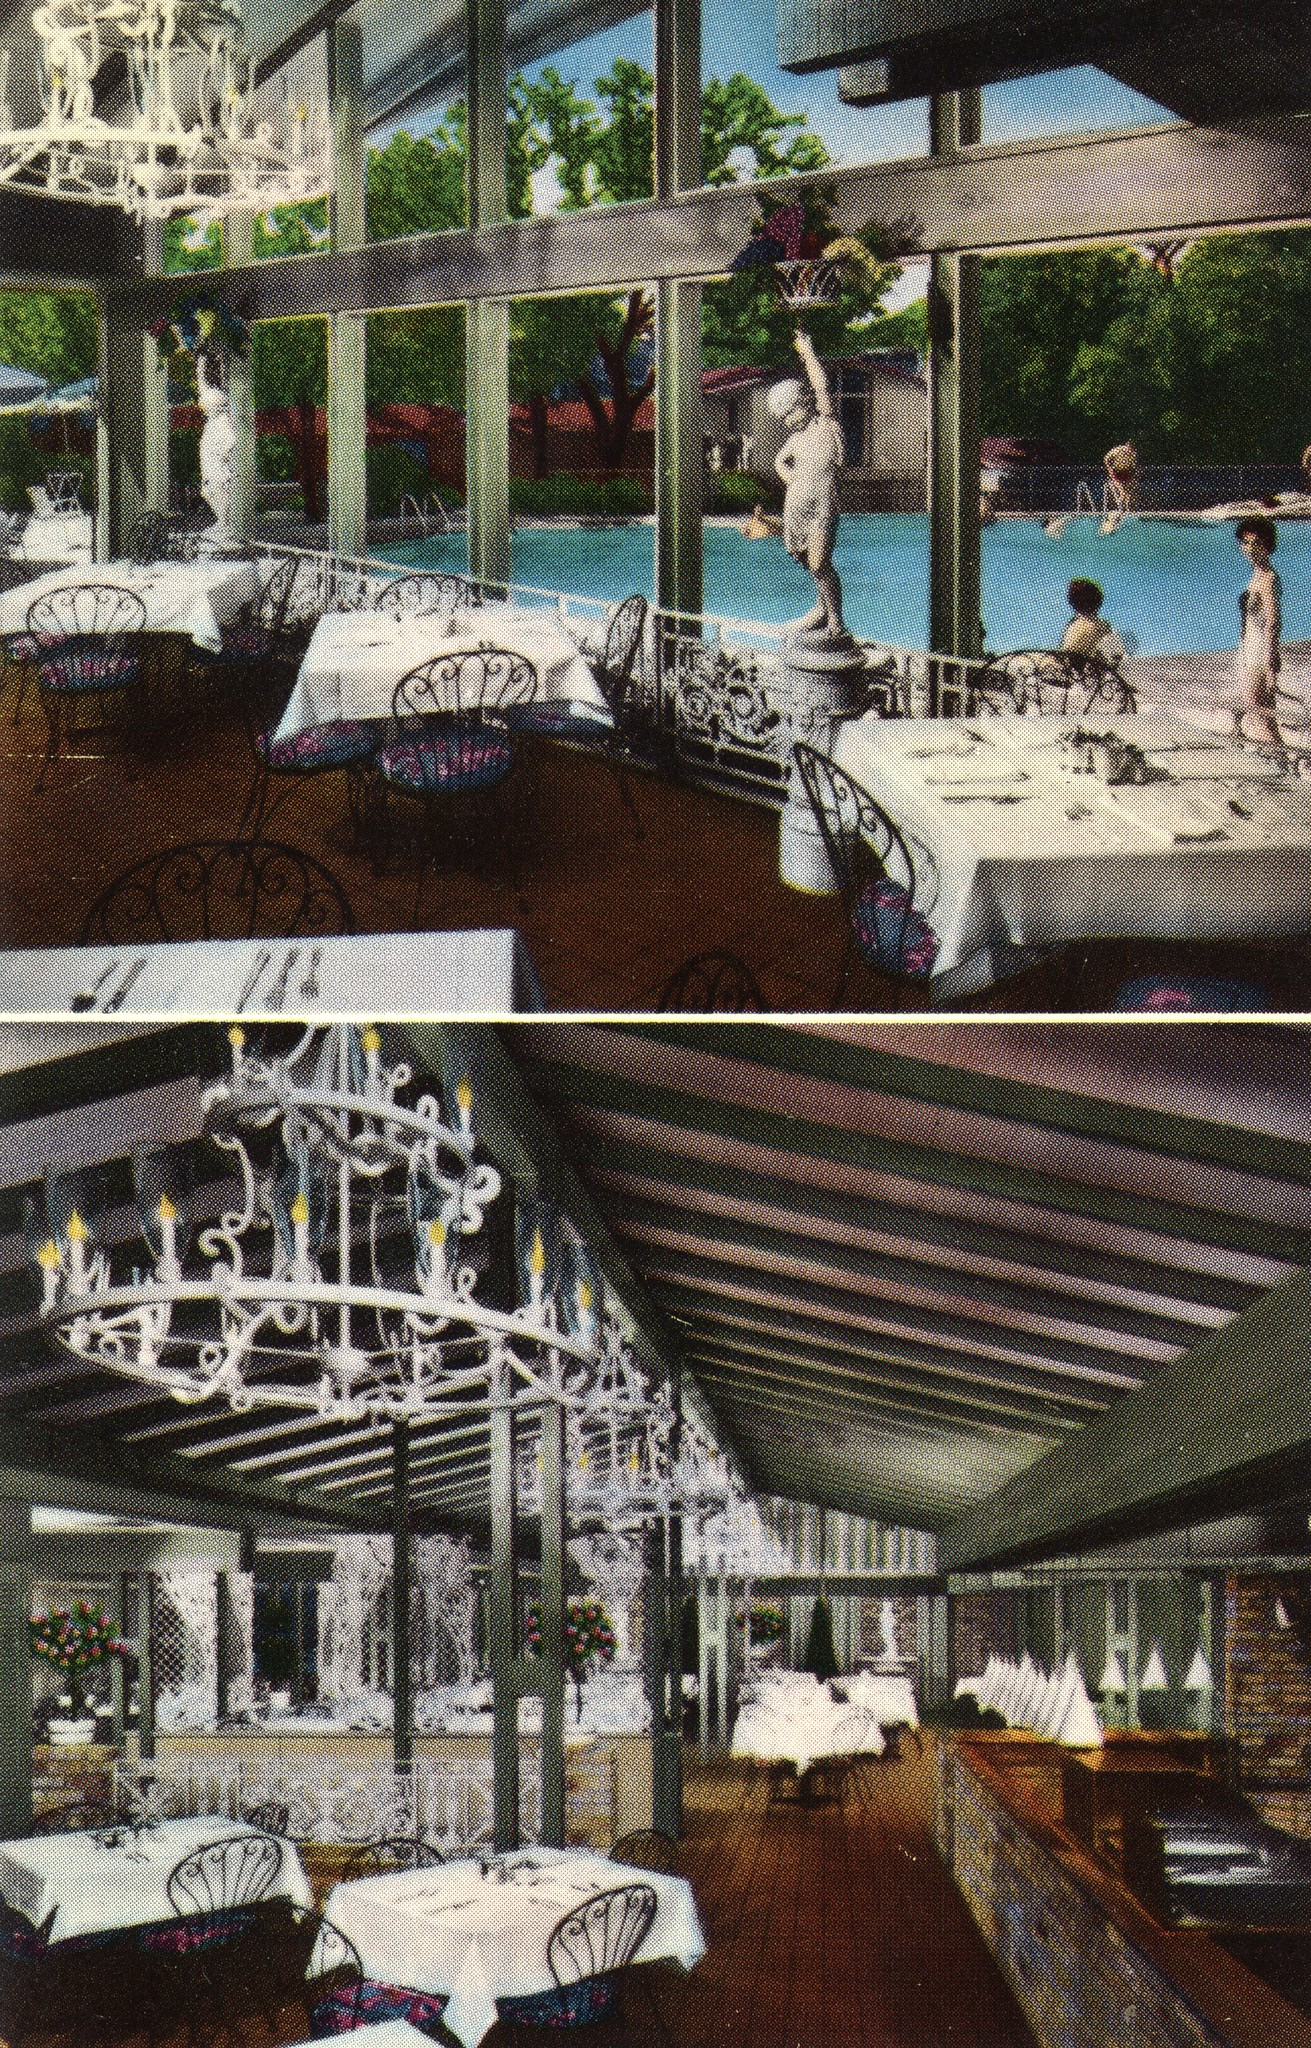 Terrace Motor Hotel - Austin, Texas